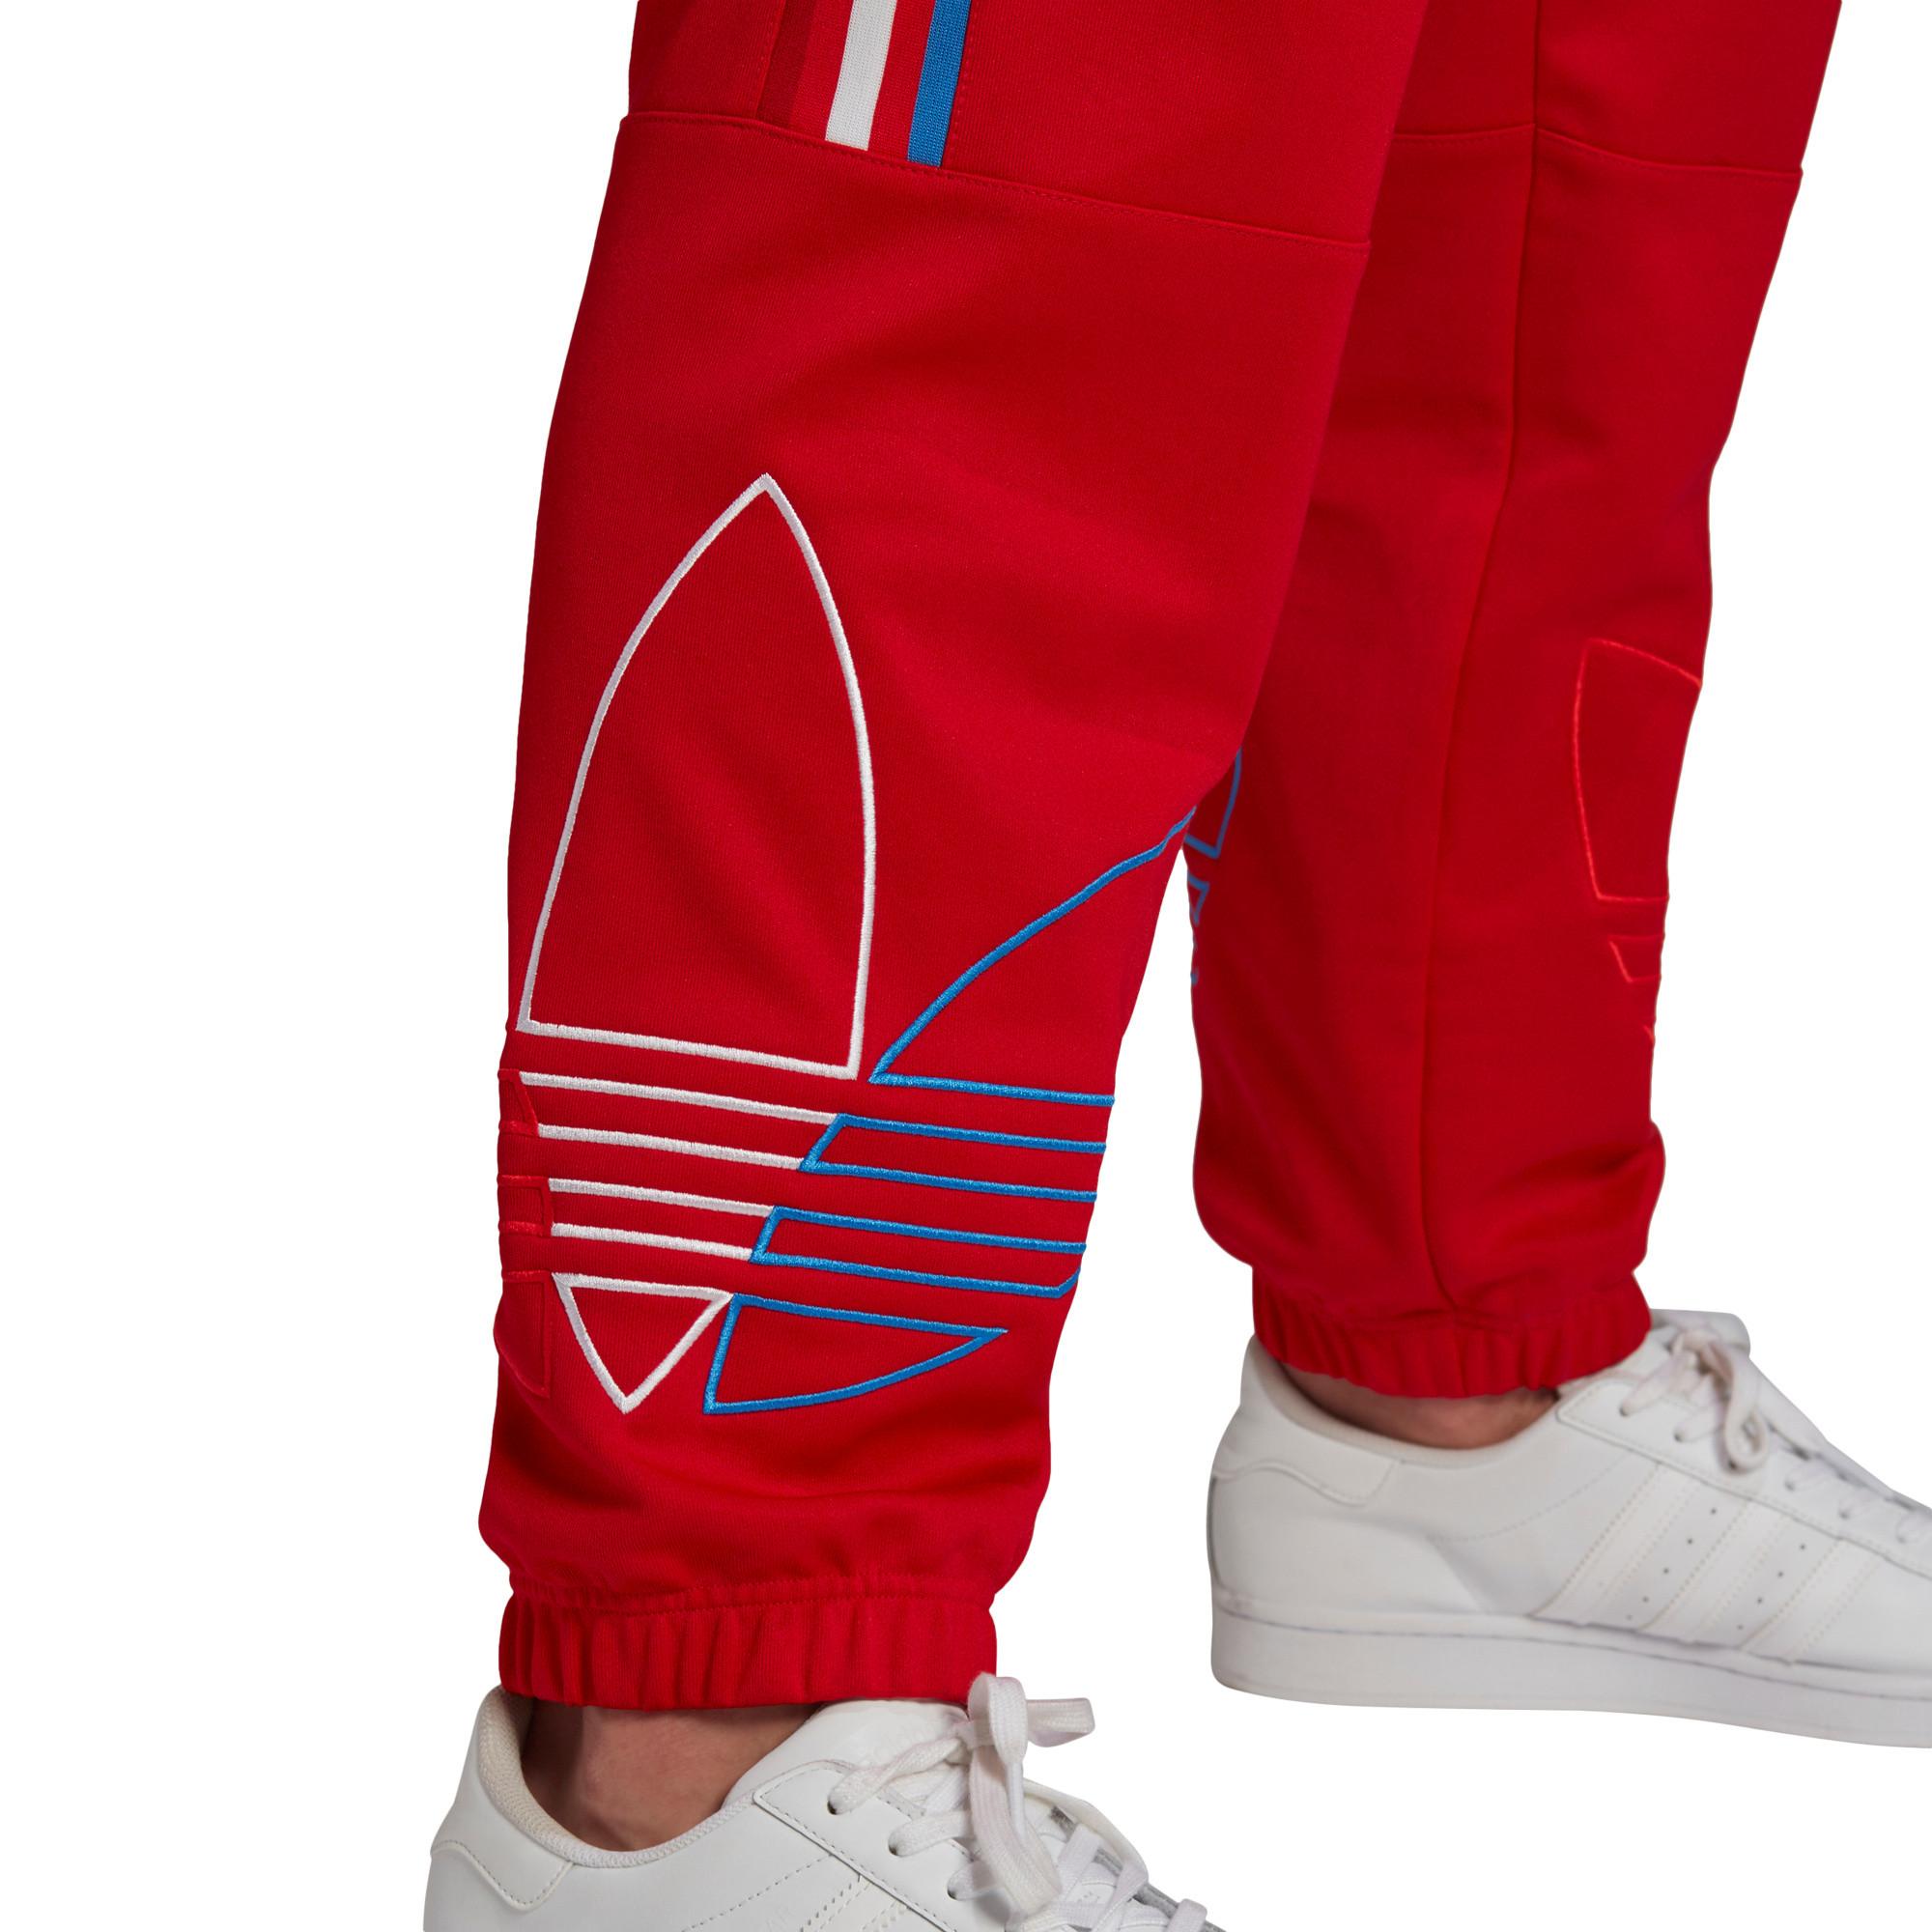 Pantaloni tuta adicolor, Rosso, large image number 3